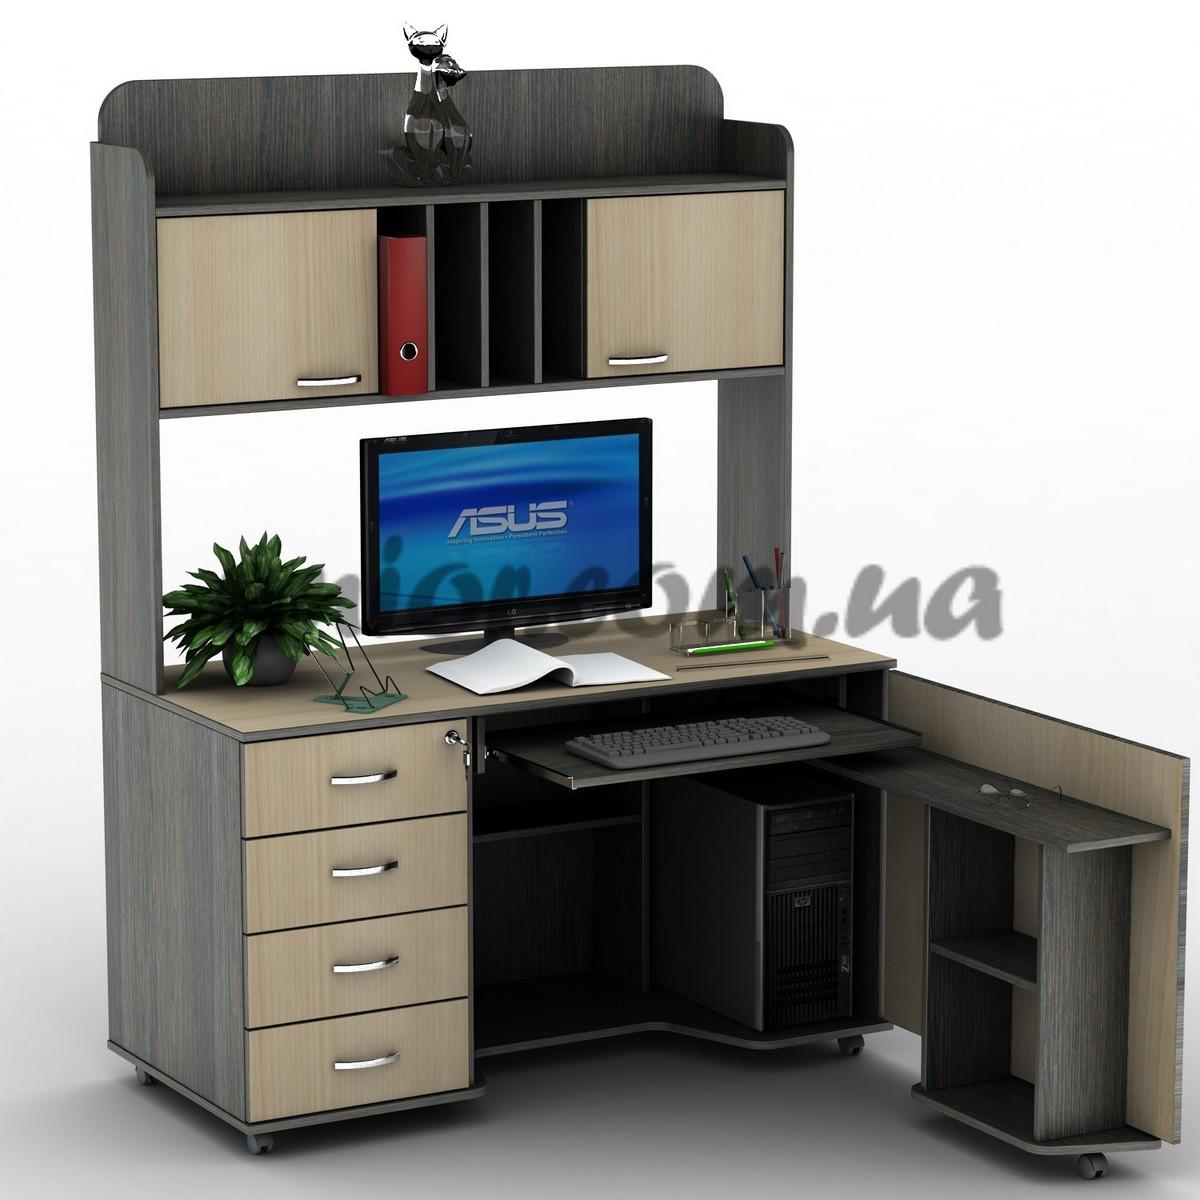 компьютерные столы компьютерные ...: www.unior-mebel.com.ua/kompyuternie-stoli/tisa/su-16.html